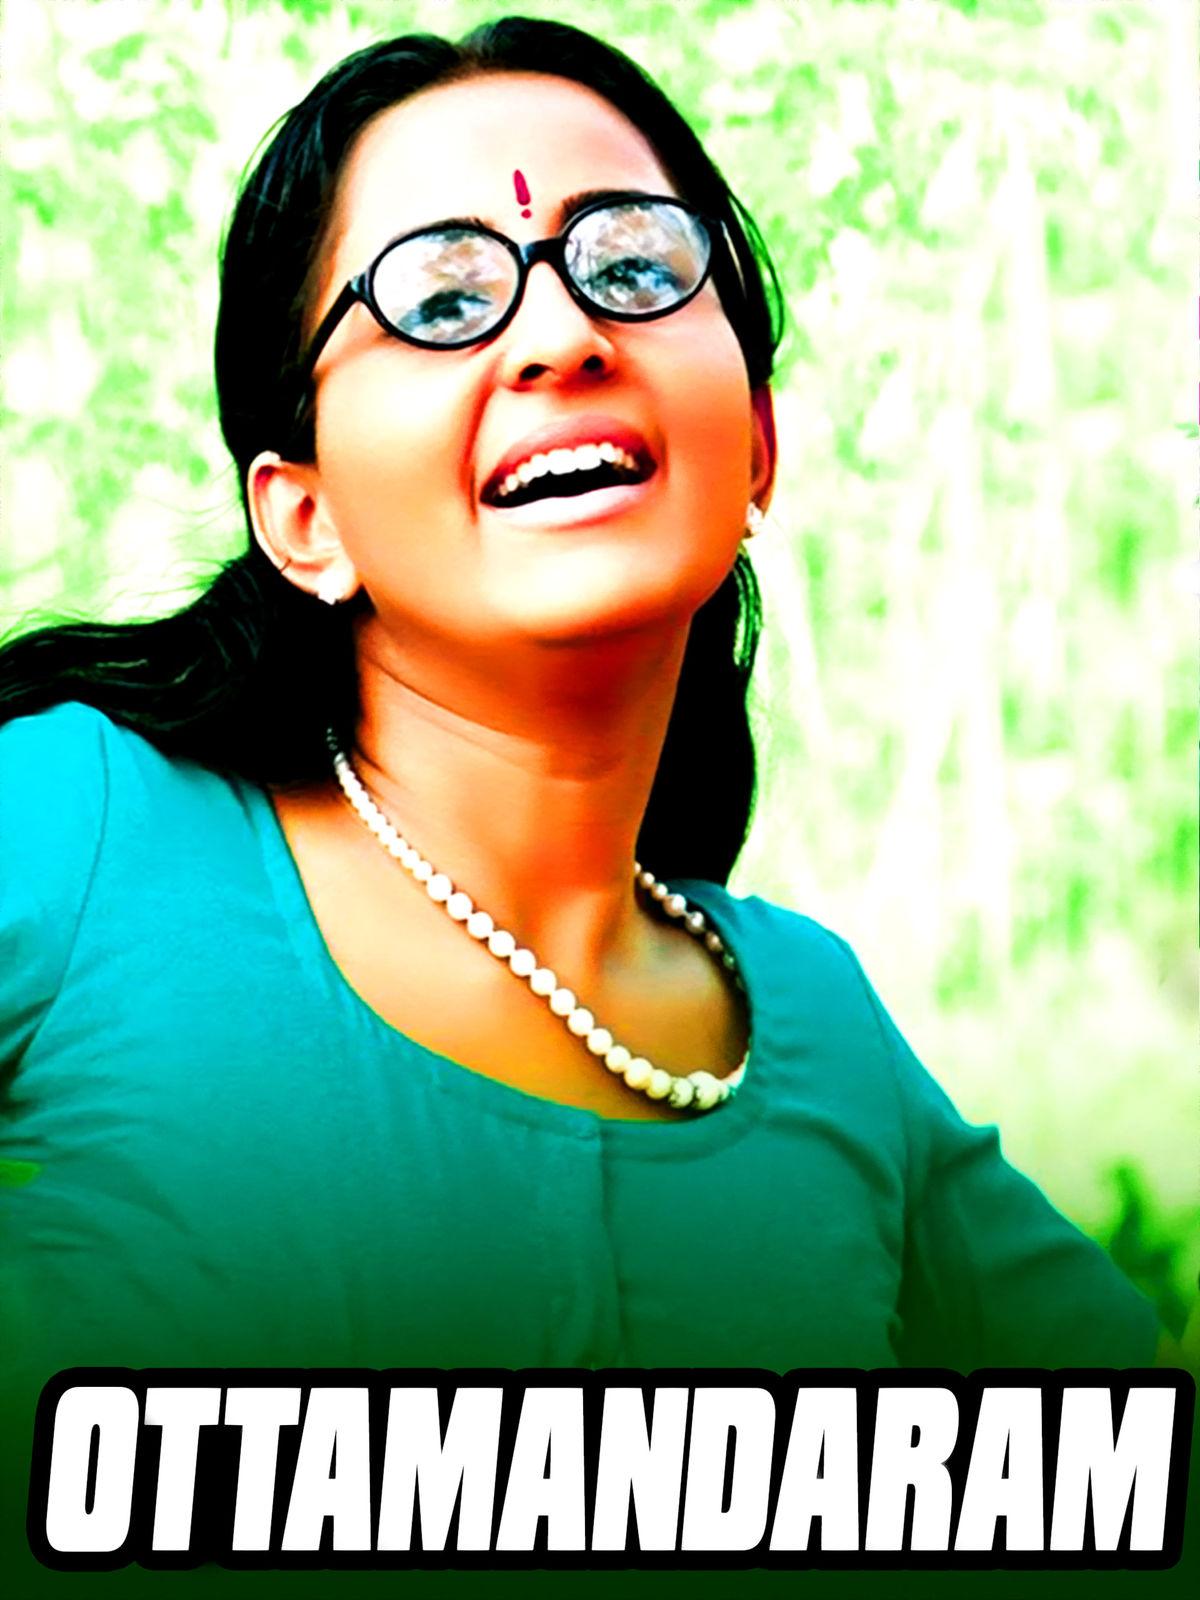 Satheesh Vettikavala Best Movies, TV Shows and Web Series List